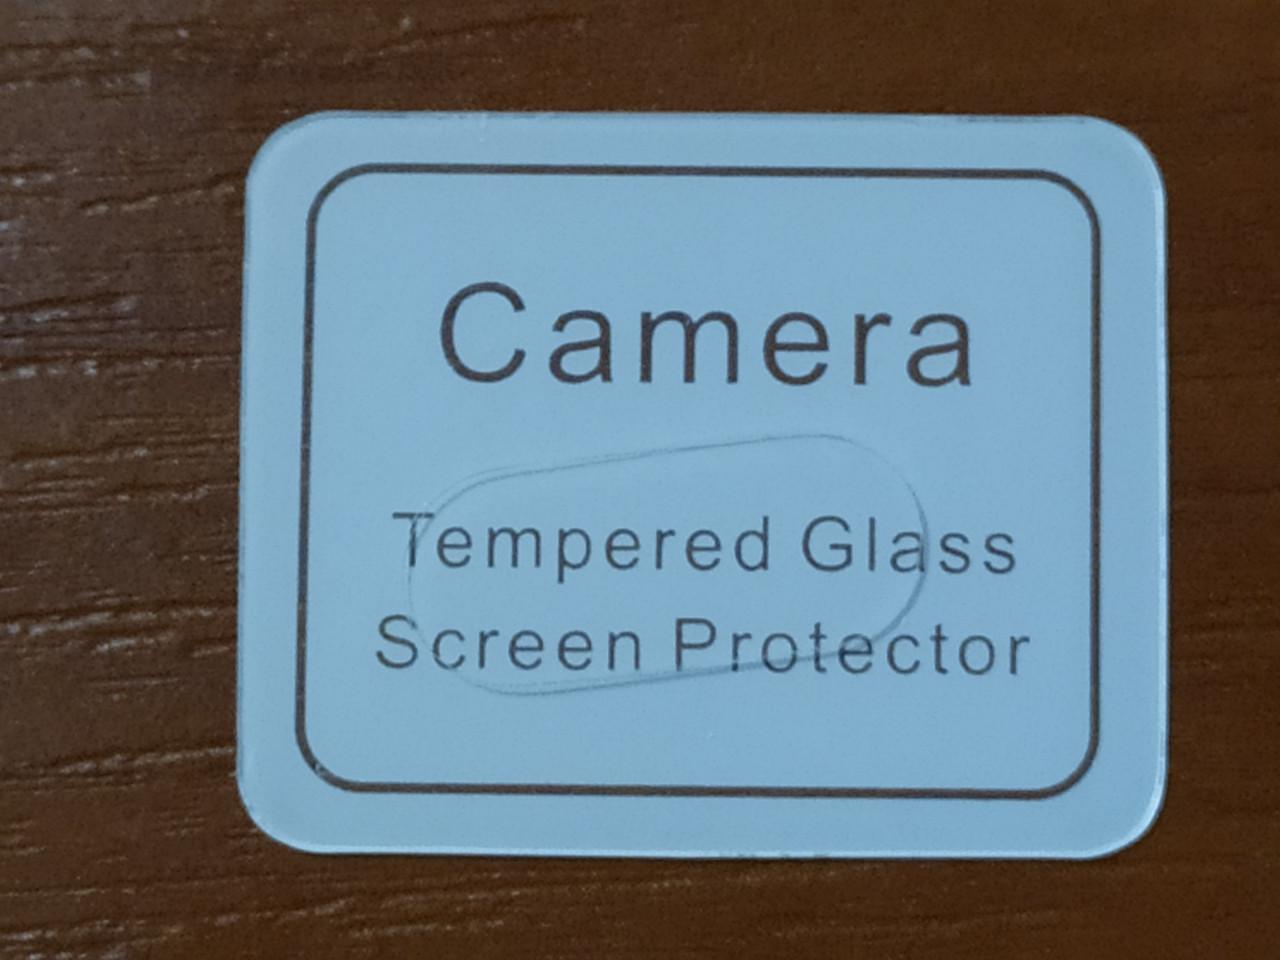 Защитное стекло на камеру Tempered Glass Screen Protector   для Samsung A10 / A10s / M10  2019